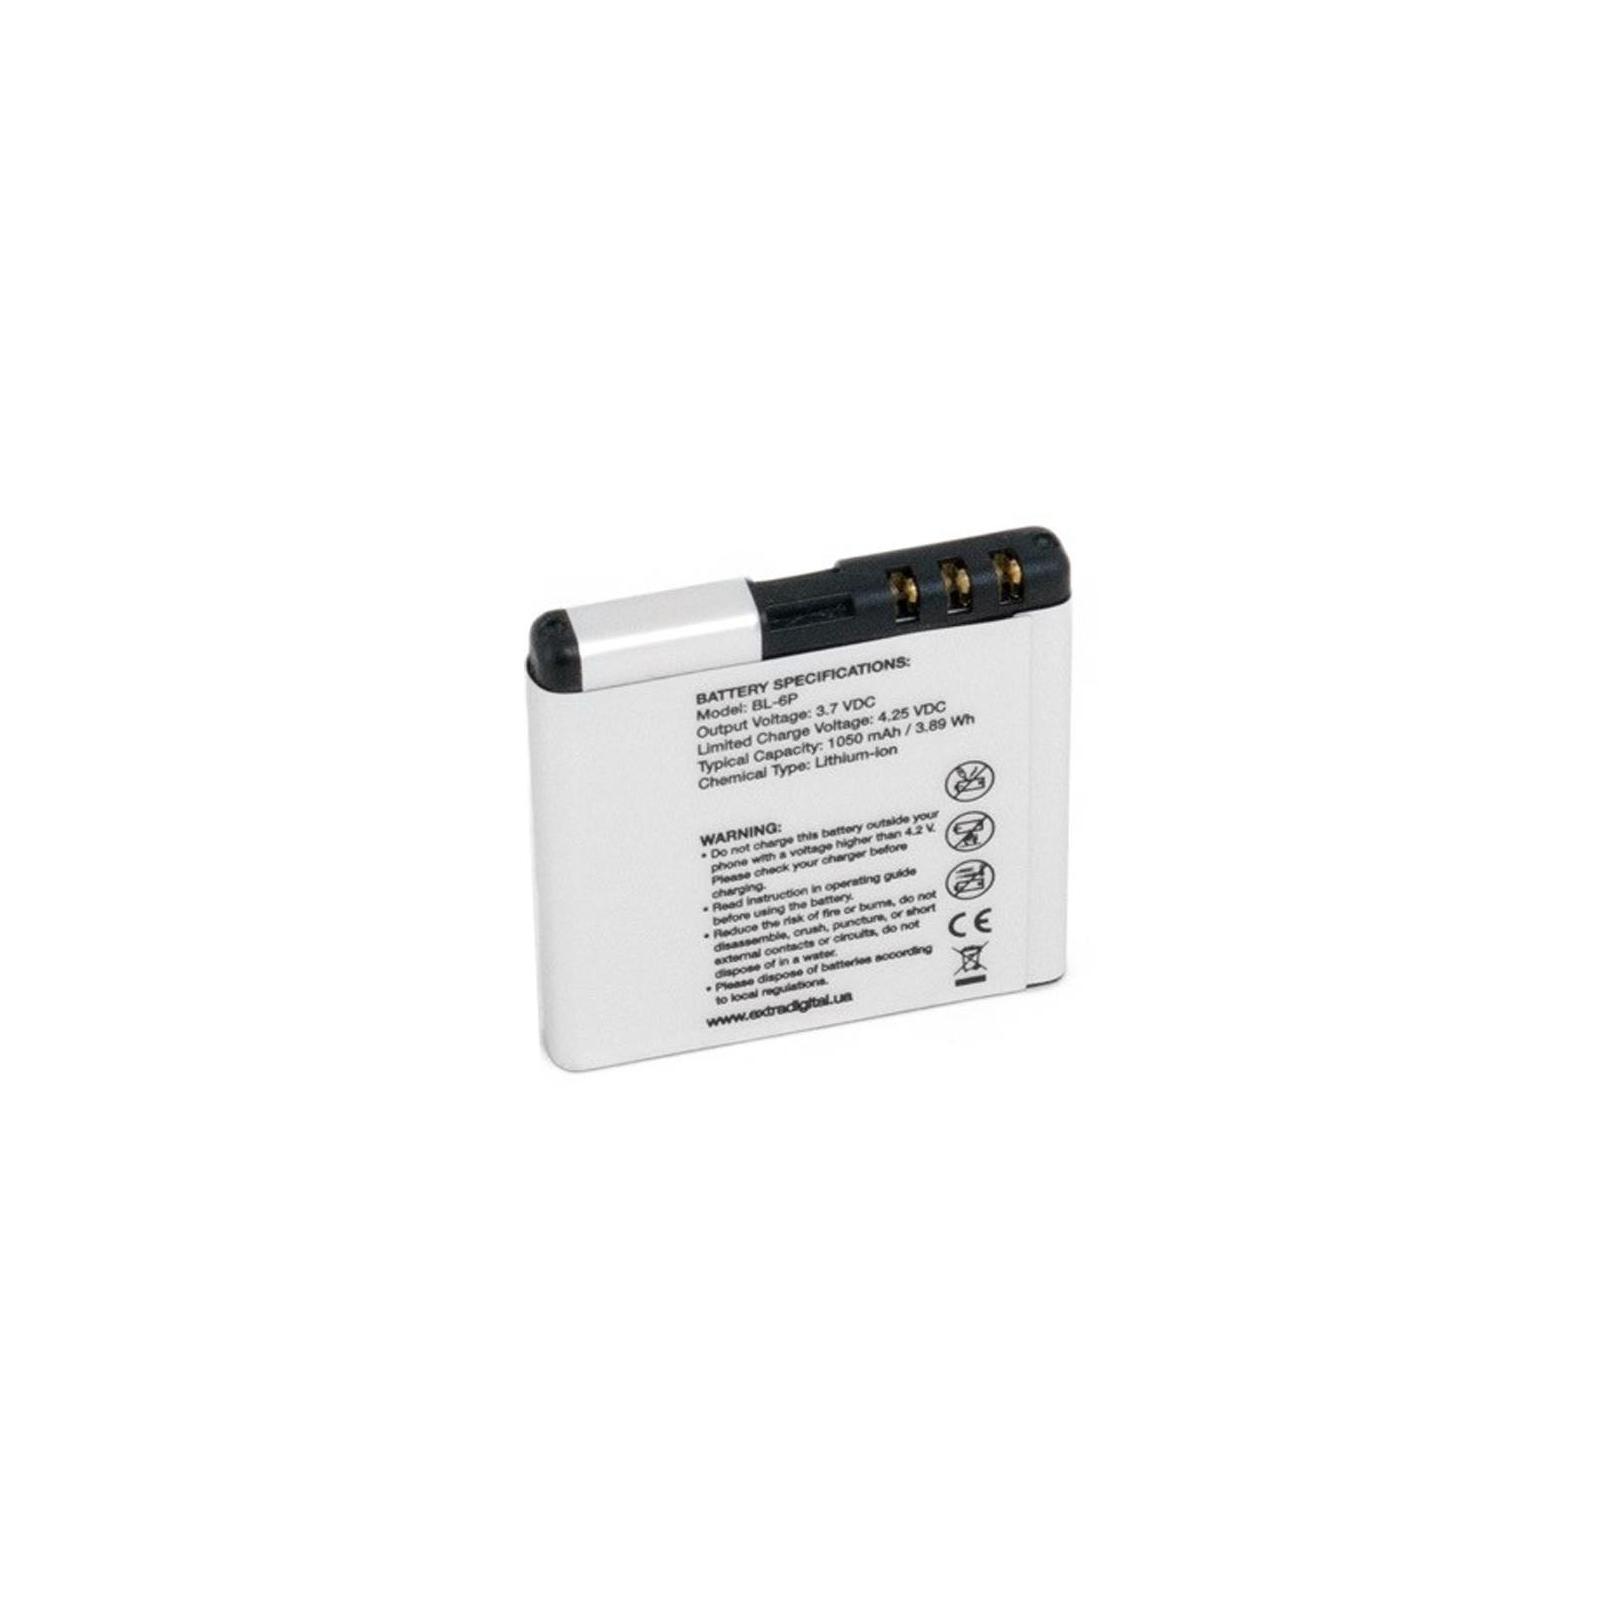 Аккумуляторная батарея EXTRADIGITAL Nokia BL-6P (1050 mAh) (BMN6282) изображение 2